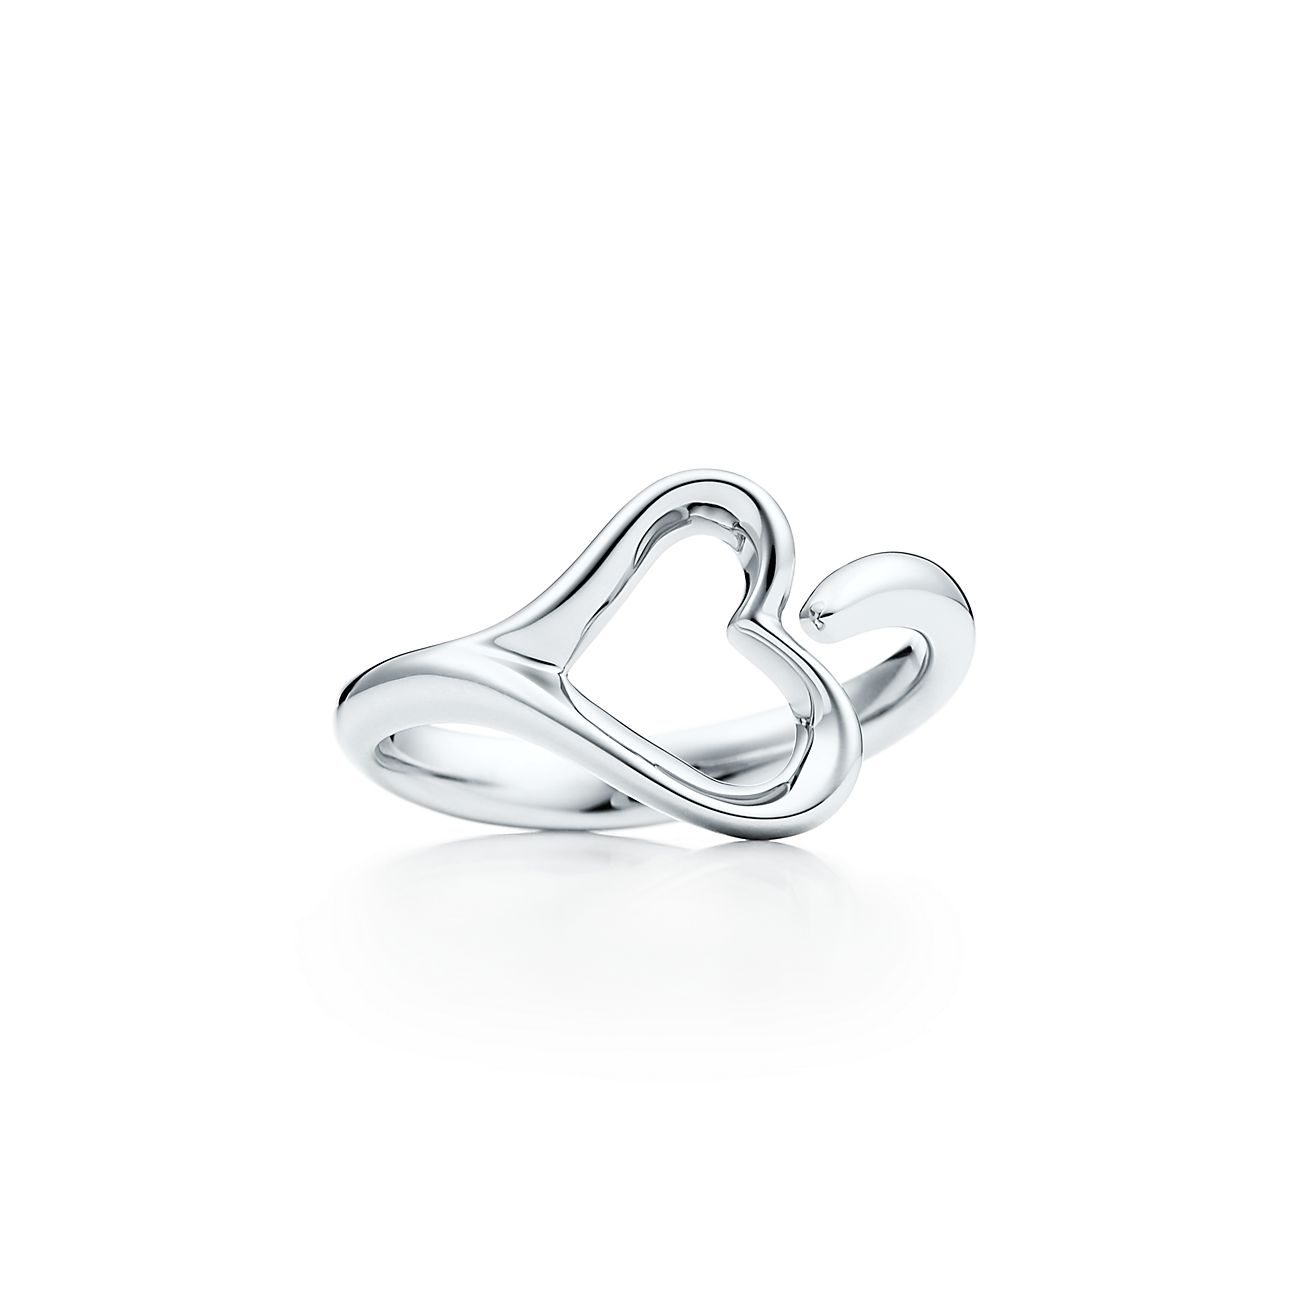 Elsa Peretti Open Heart ring in sterling silver, small - Size 7 1/2 Tiffany & Co.